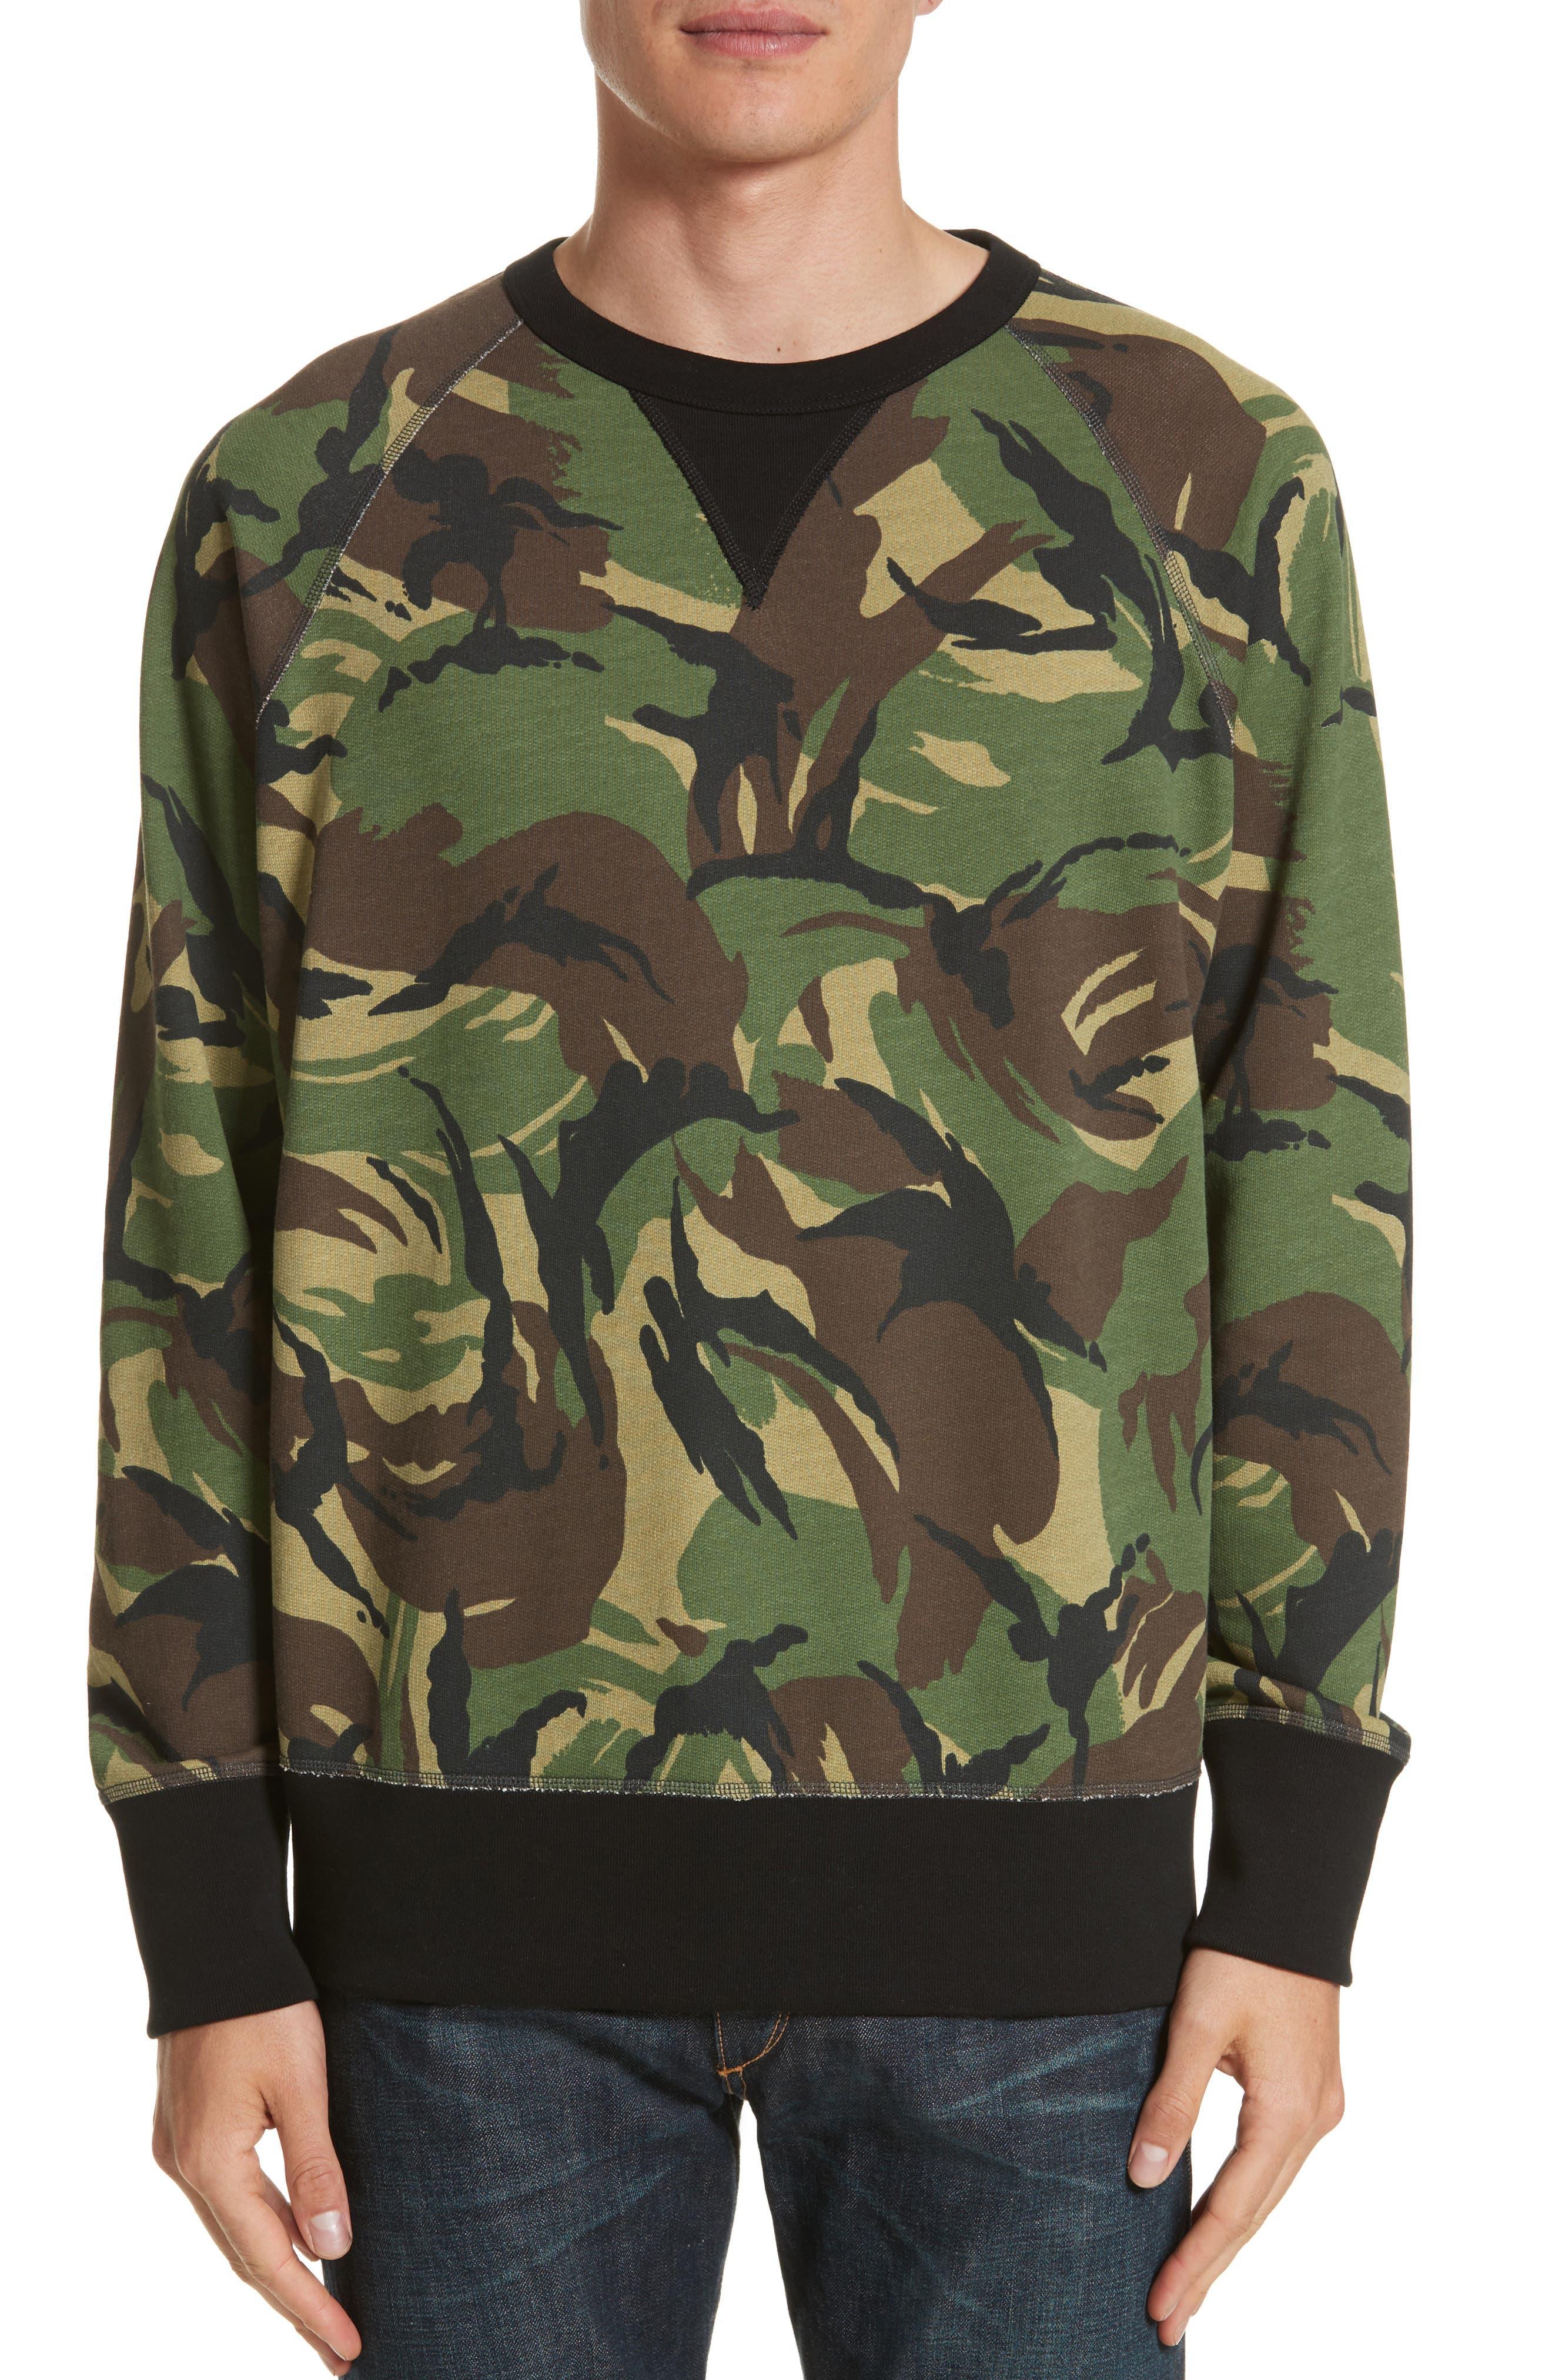 RAG & BONE Camo Sweatshirt